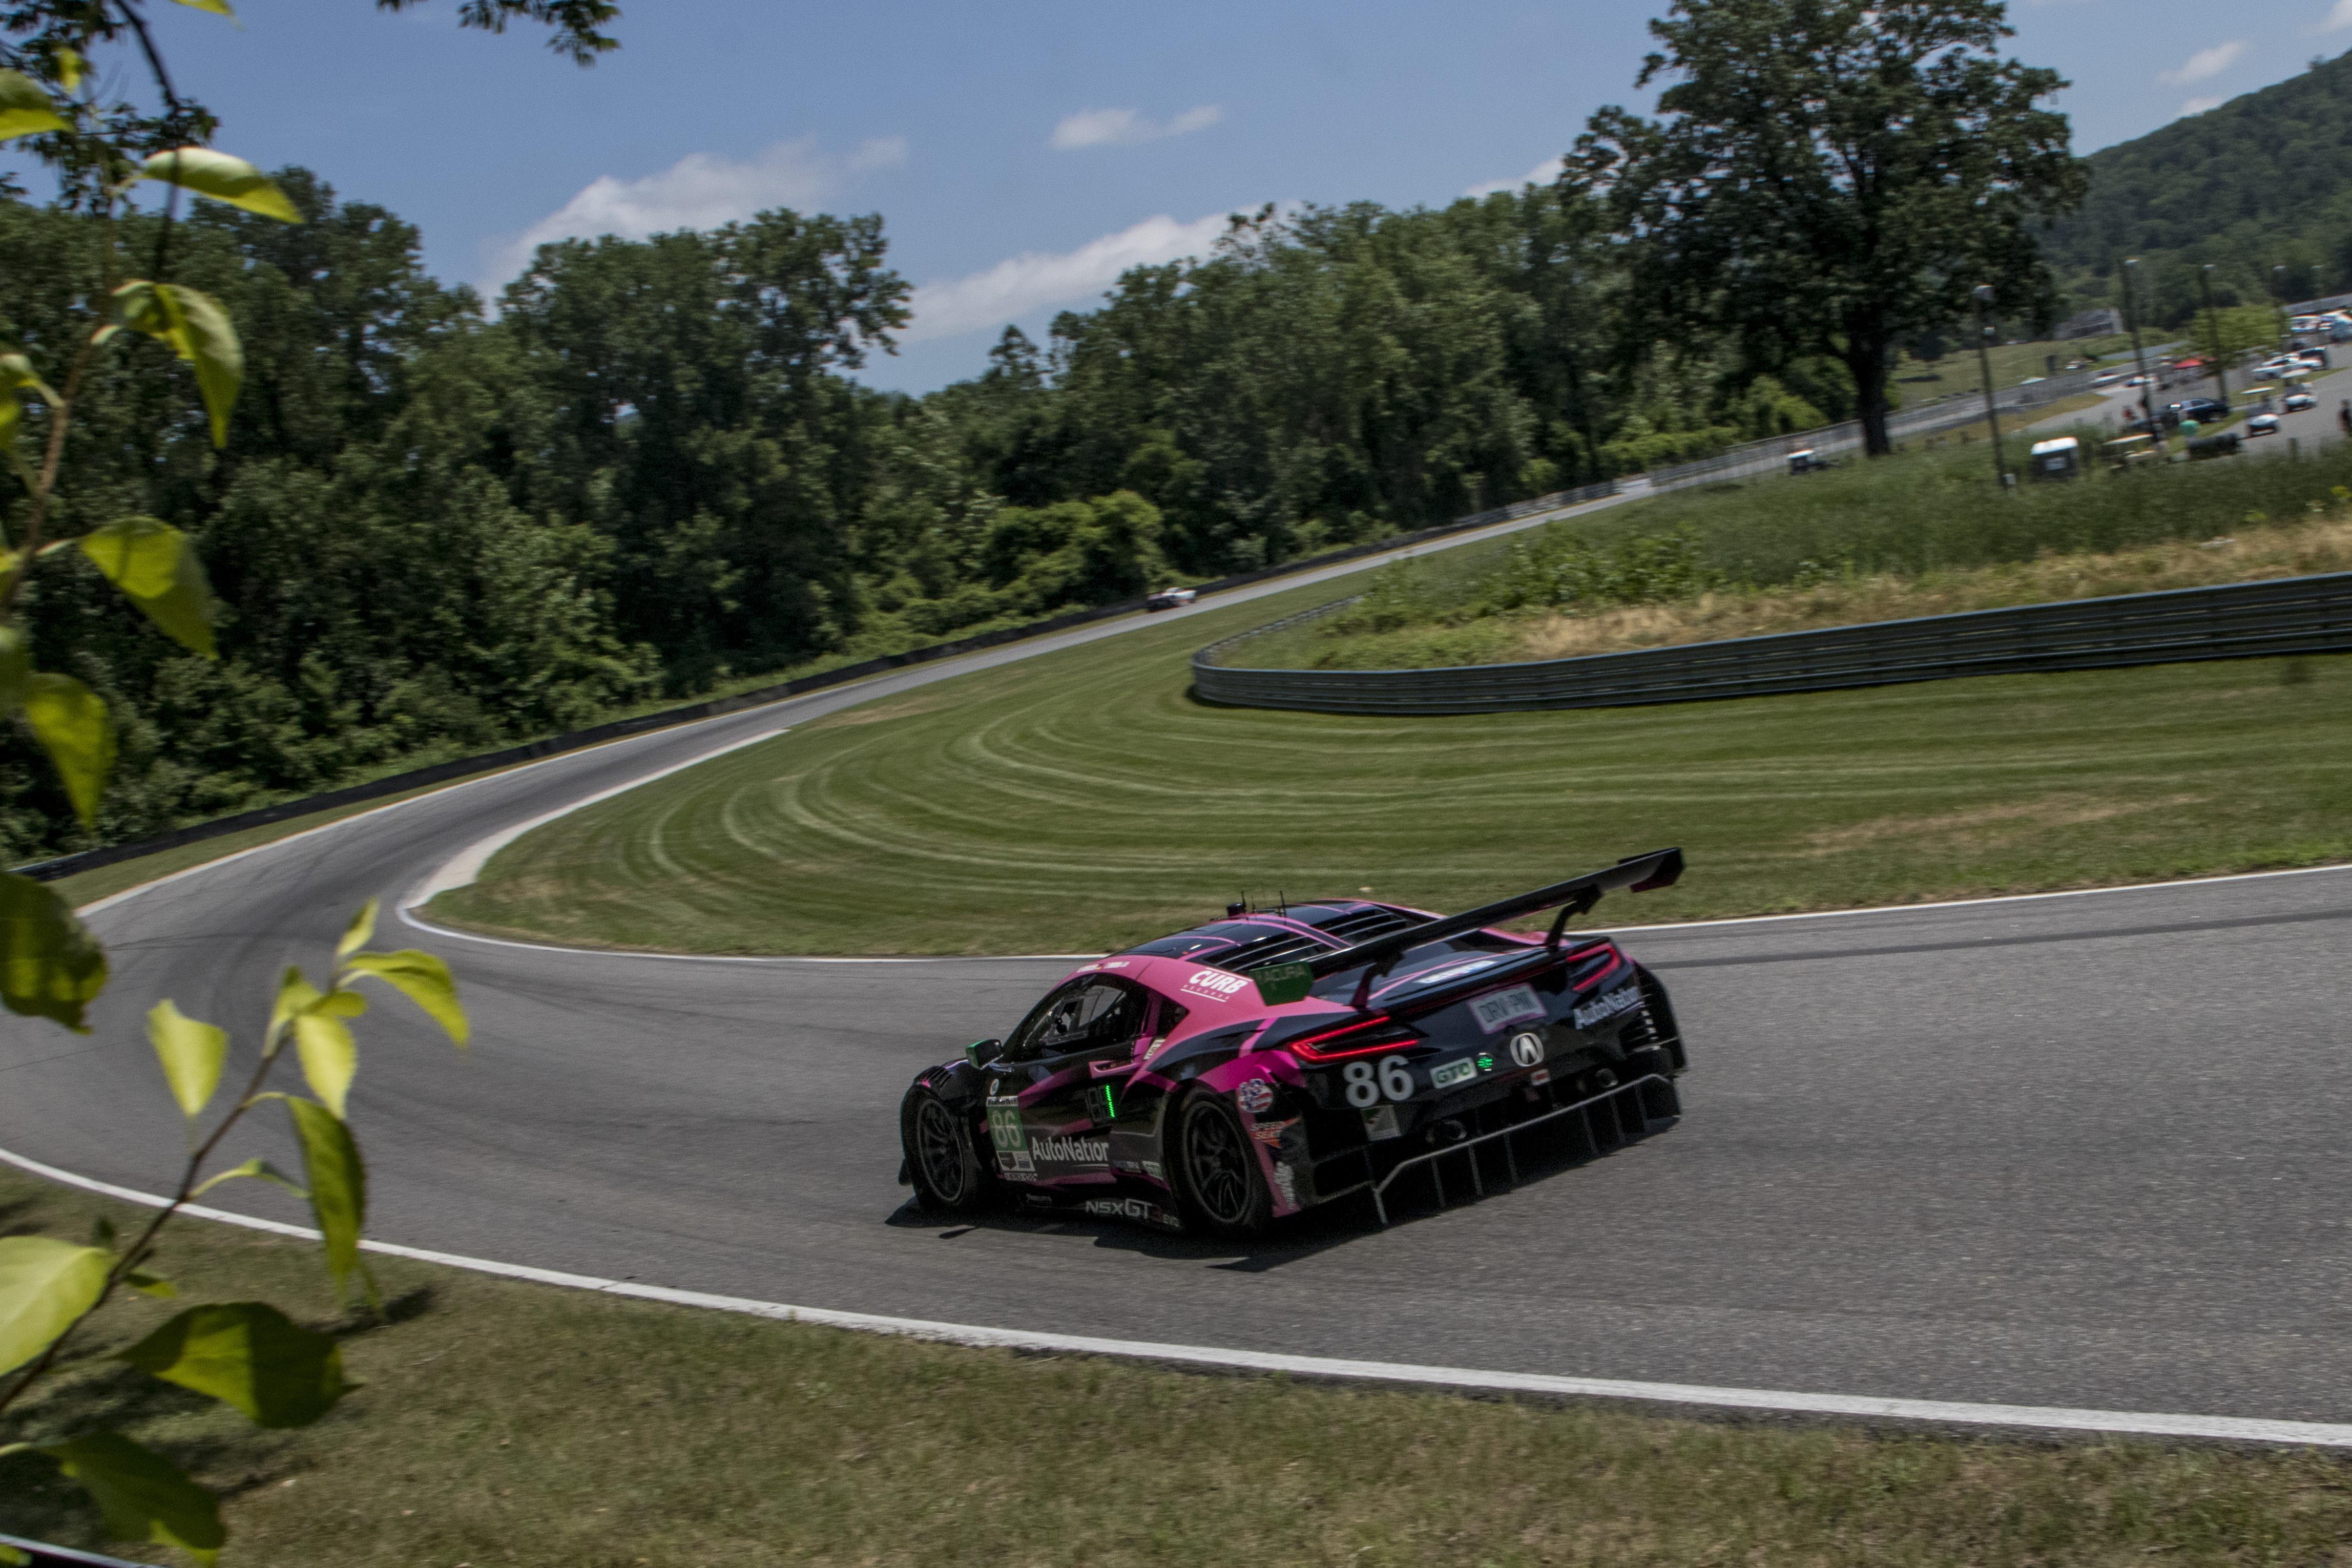 Mario Farnbacher Trent Hindman Meyer Shank Racing Acura NSX GT3 IMSA WeatherTech SportsCar Championship Lime Rock